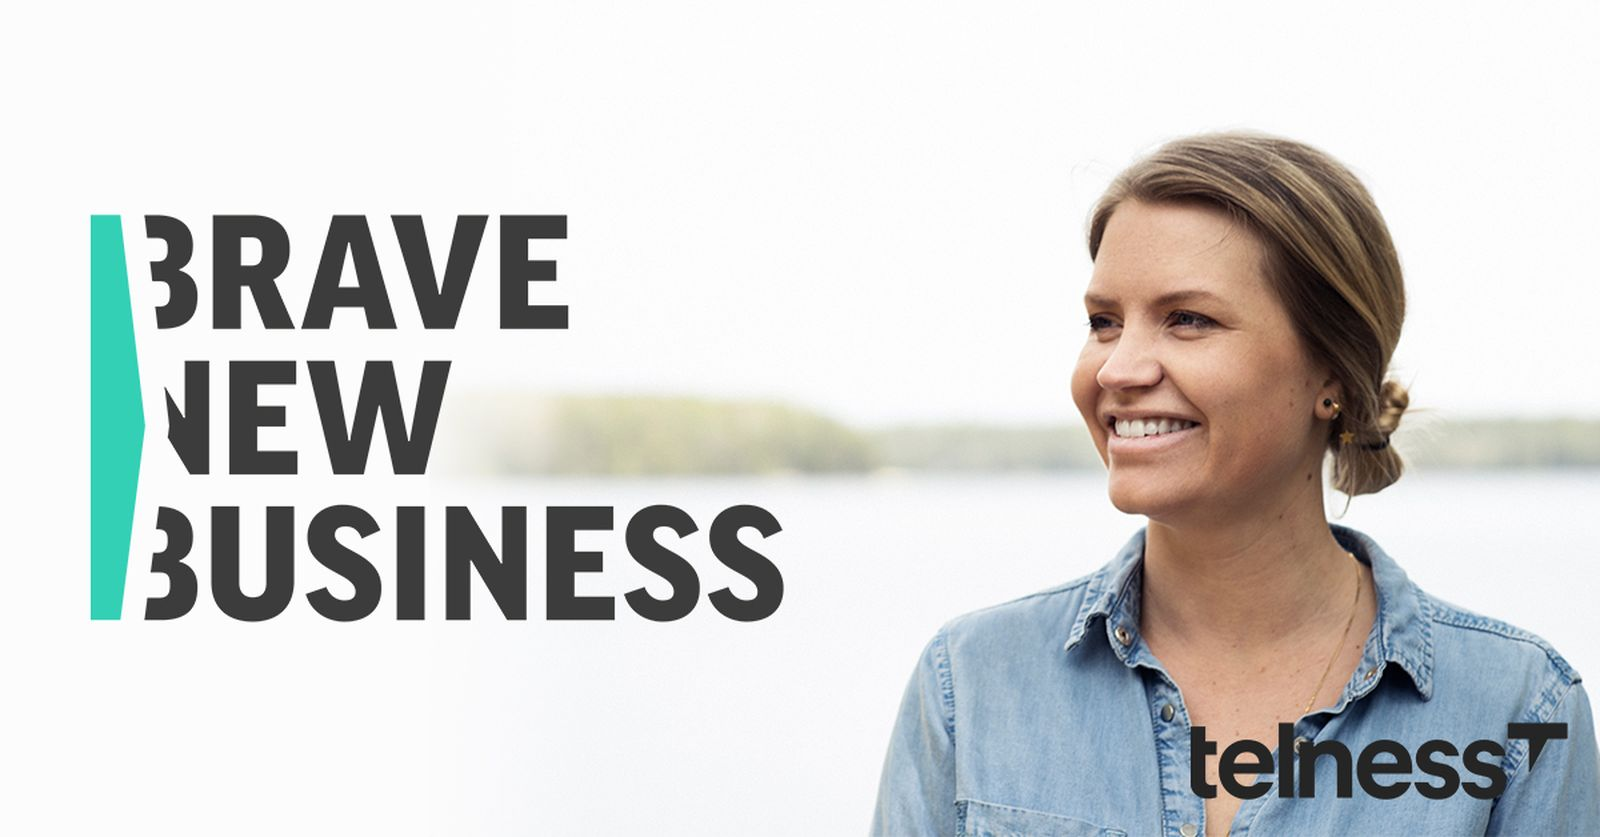 Martina Klingvall VD telness & brave new business logo